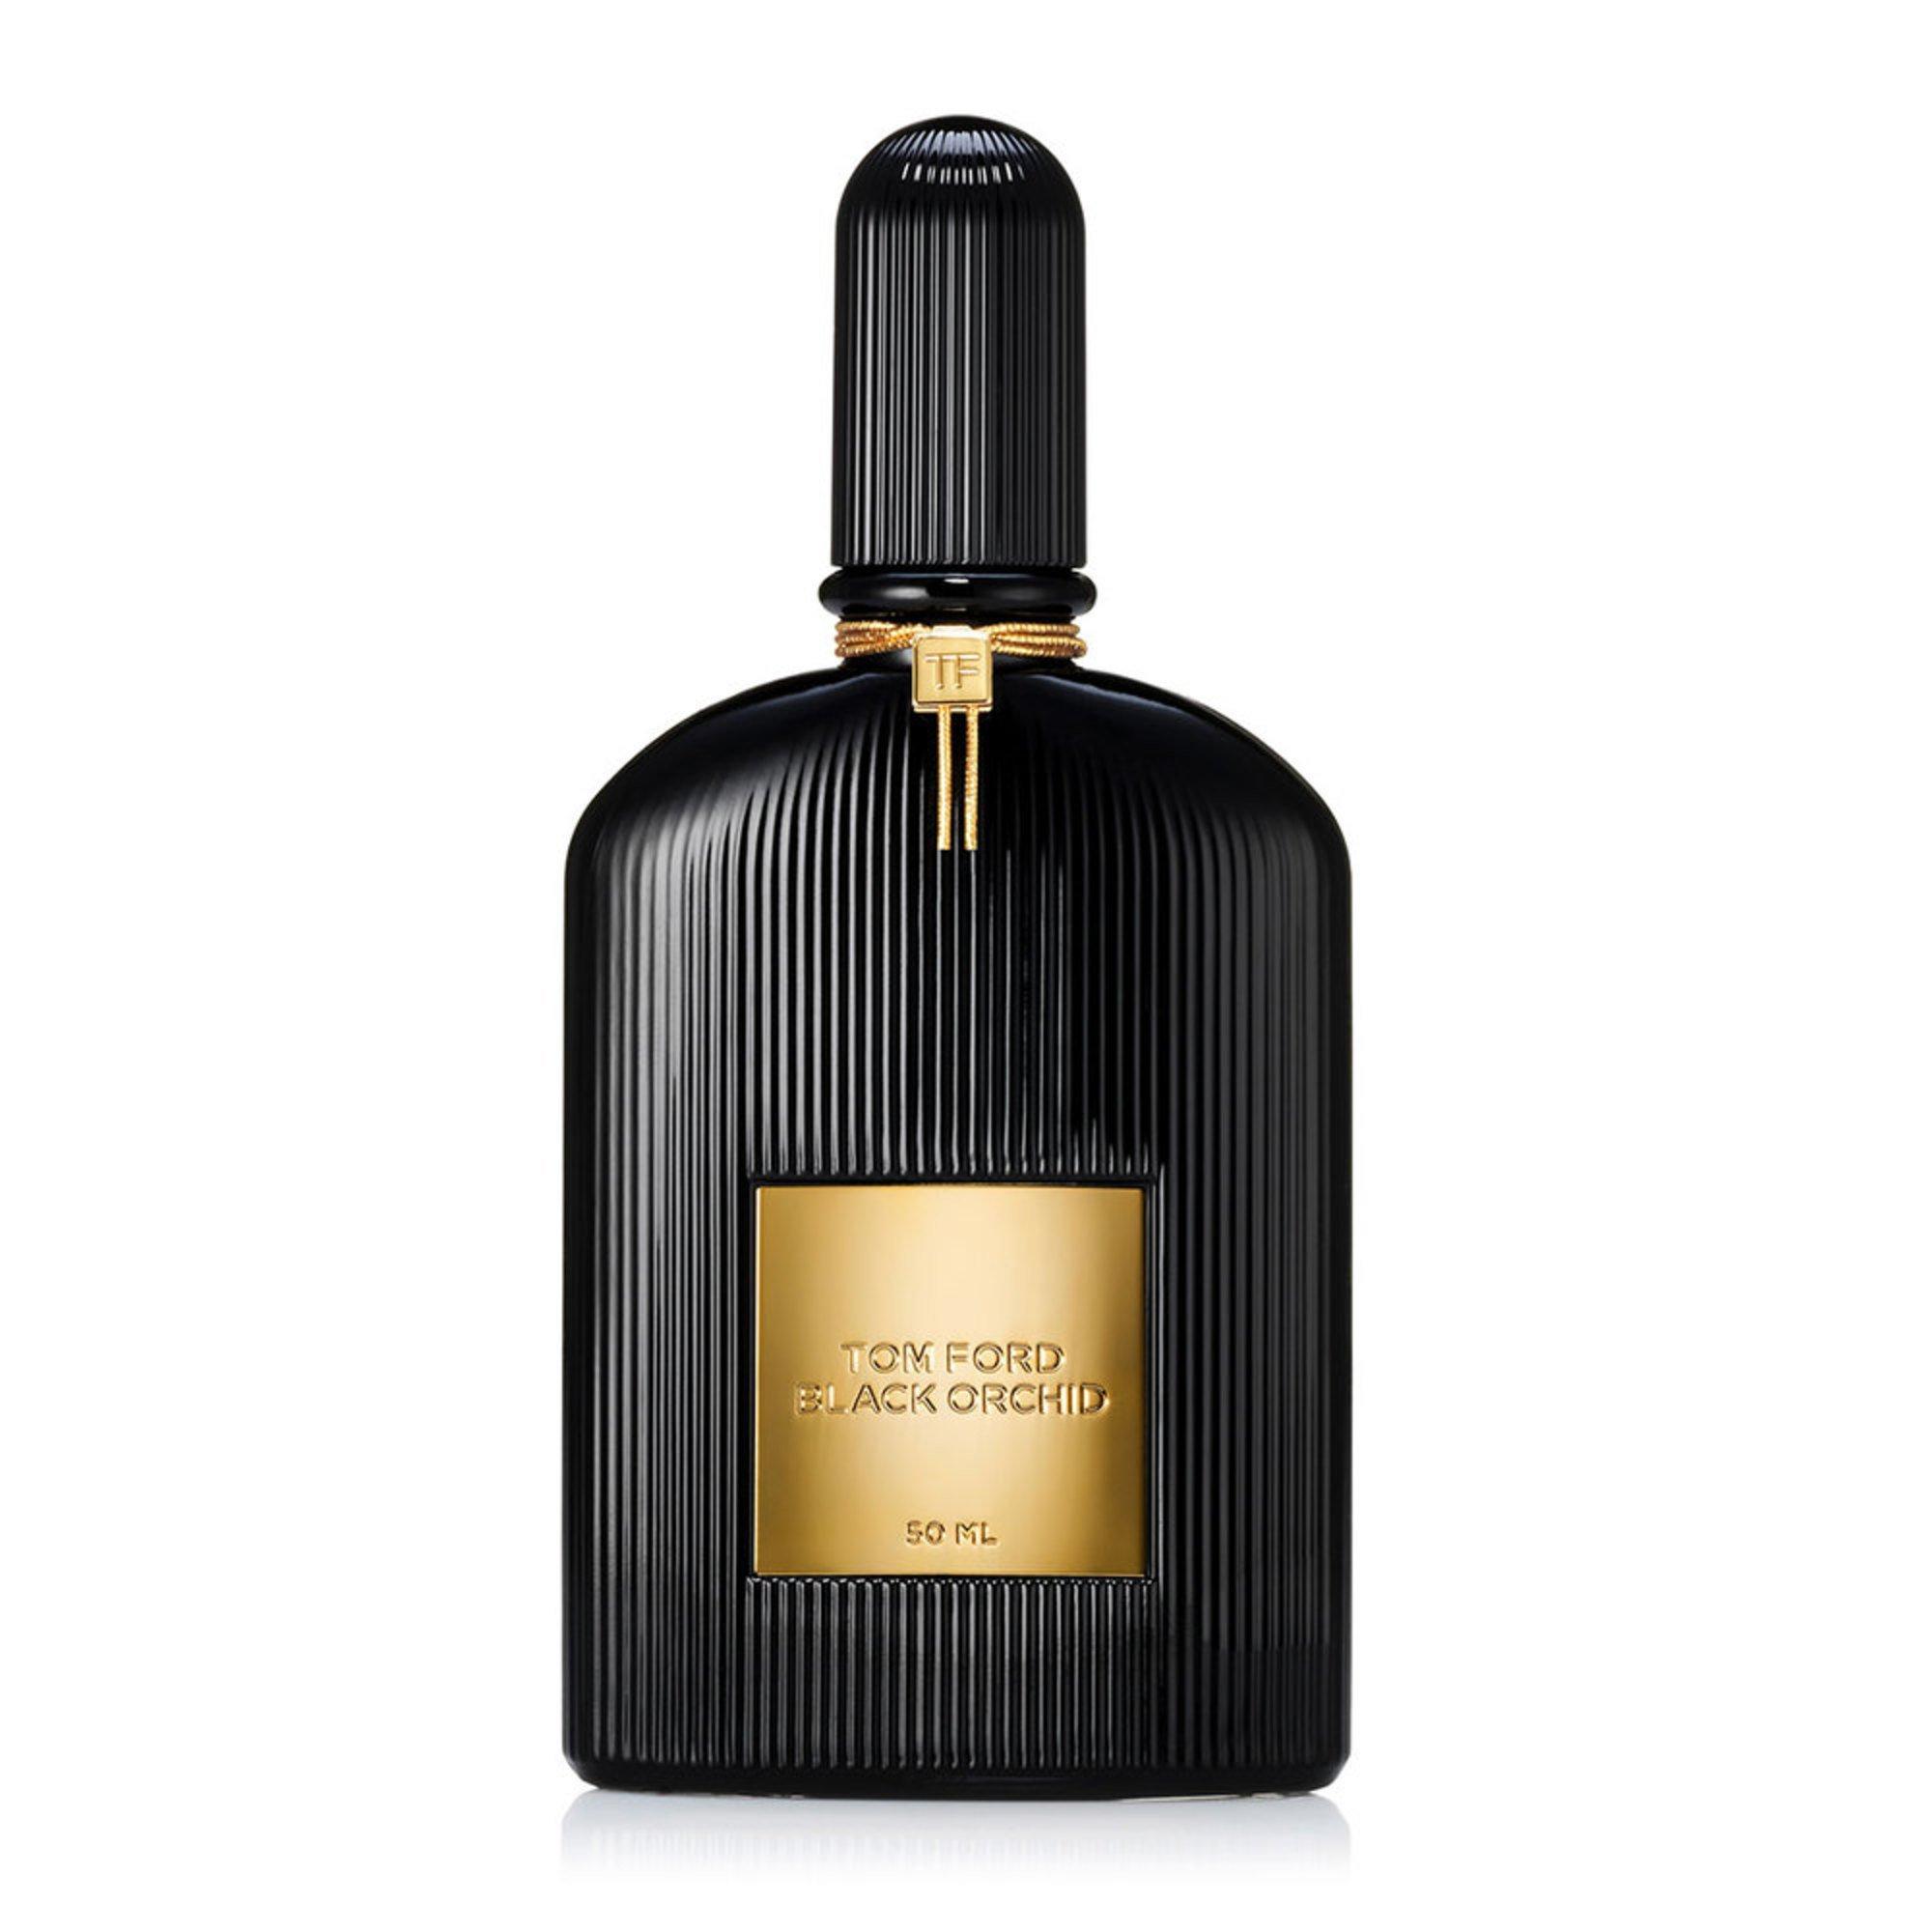 Tom Ford Black Orchid Eau De Parfum Perfume Health Beauty